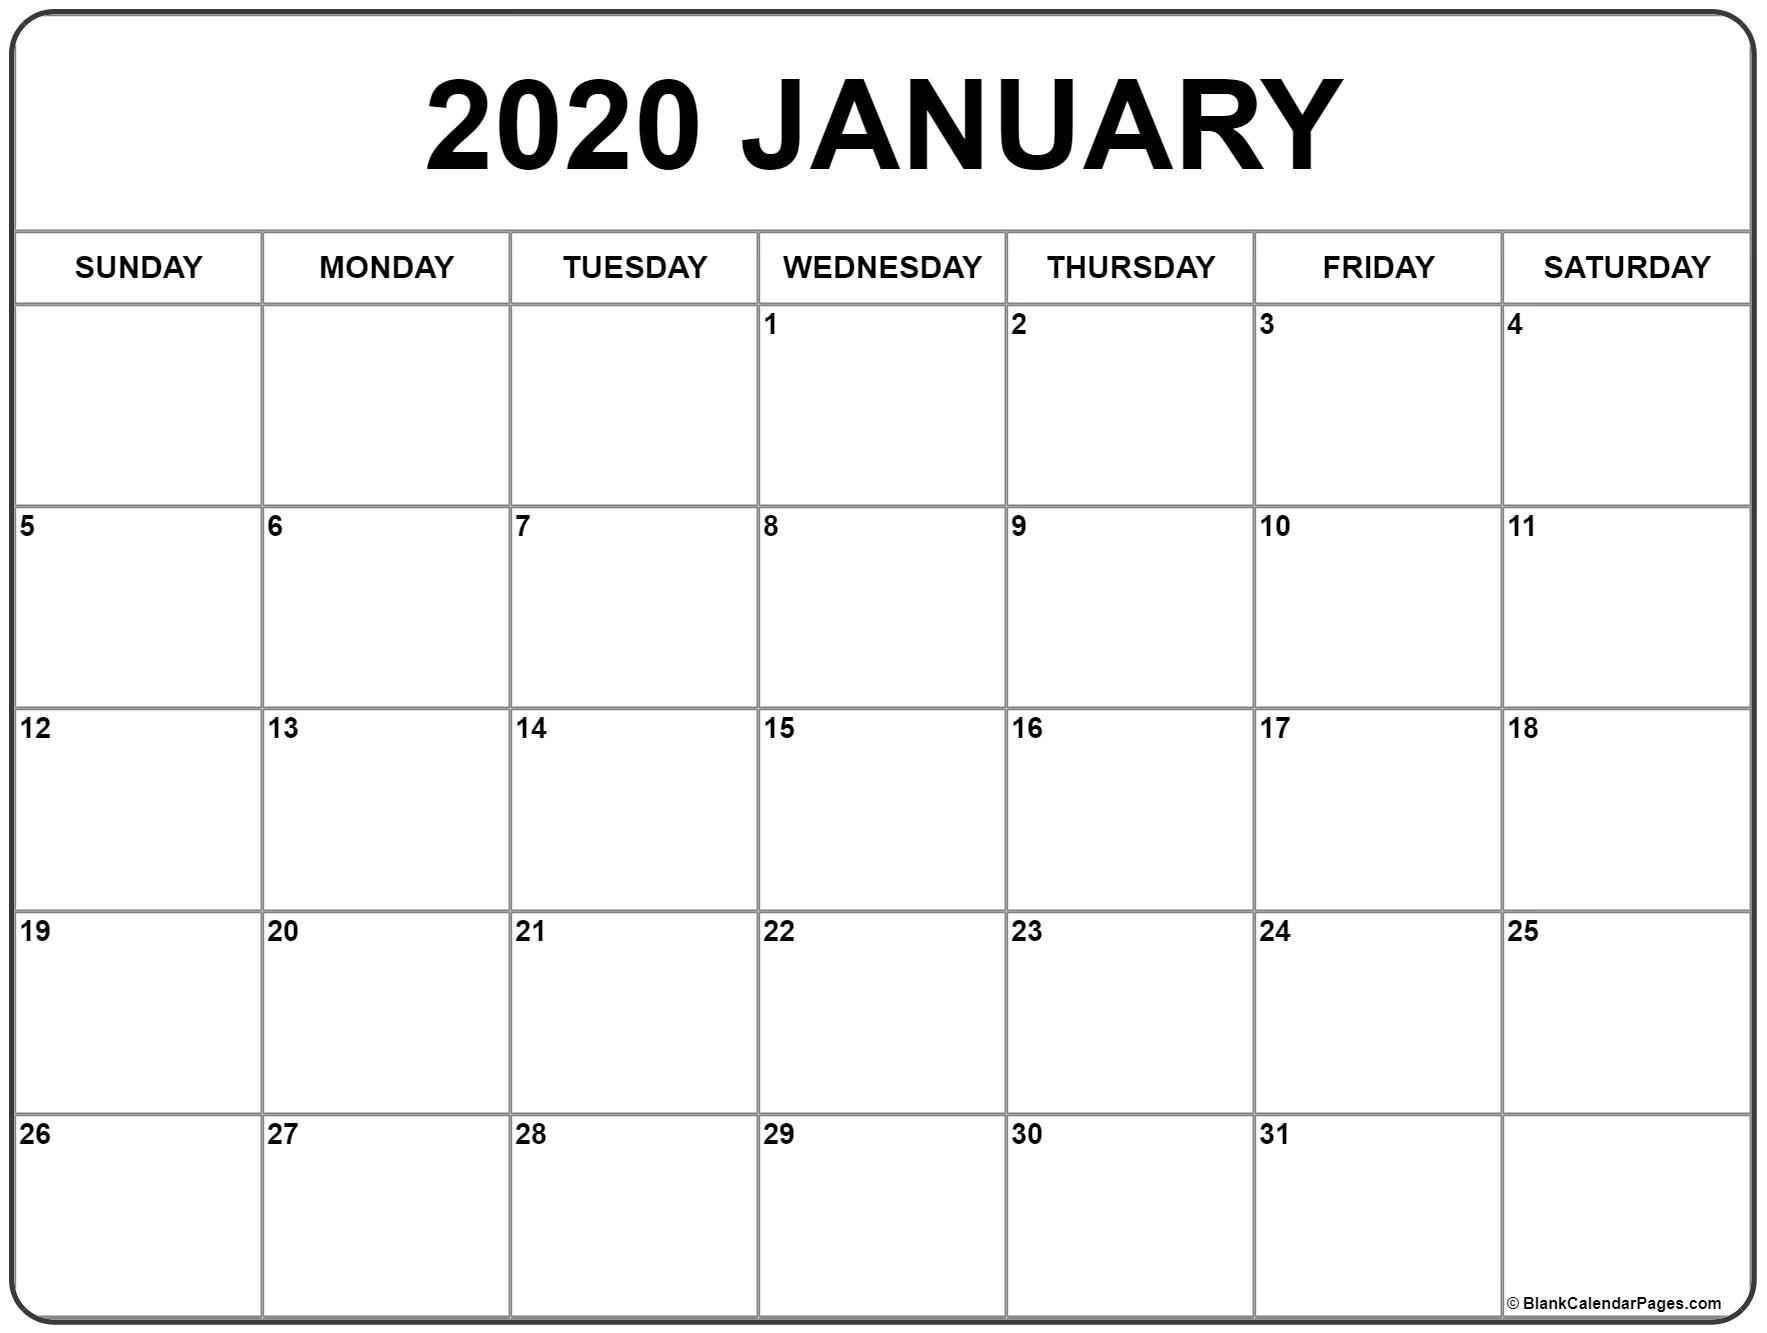 January 2020 Calendar | Free Printable Monthly Calendars  Full Page Printable 2020 Calendar